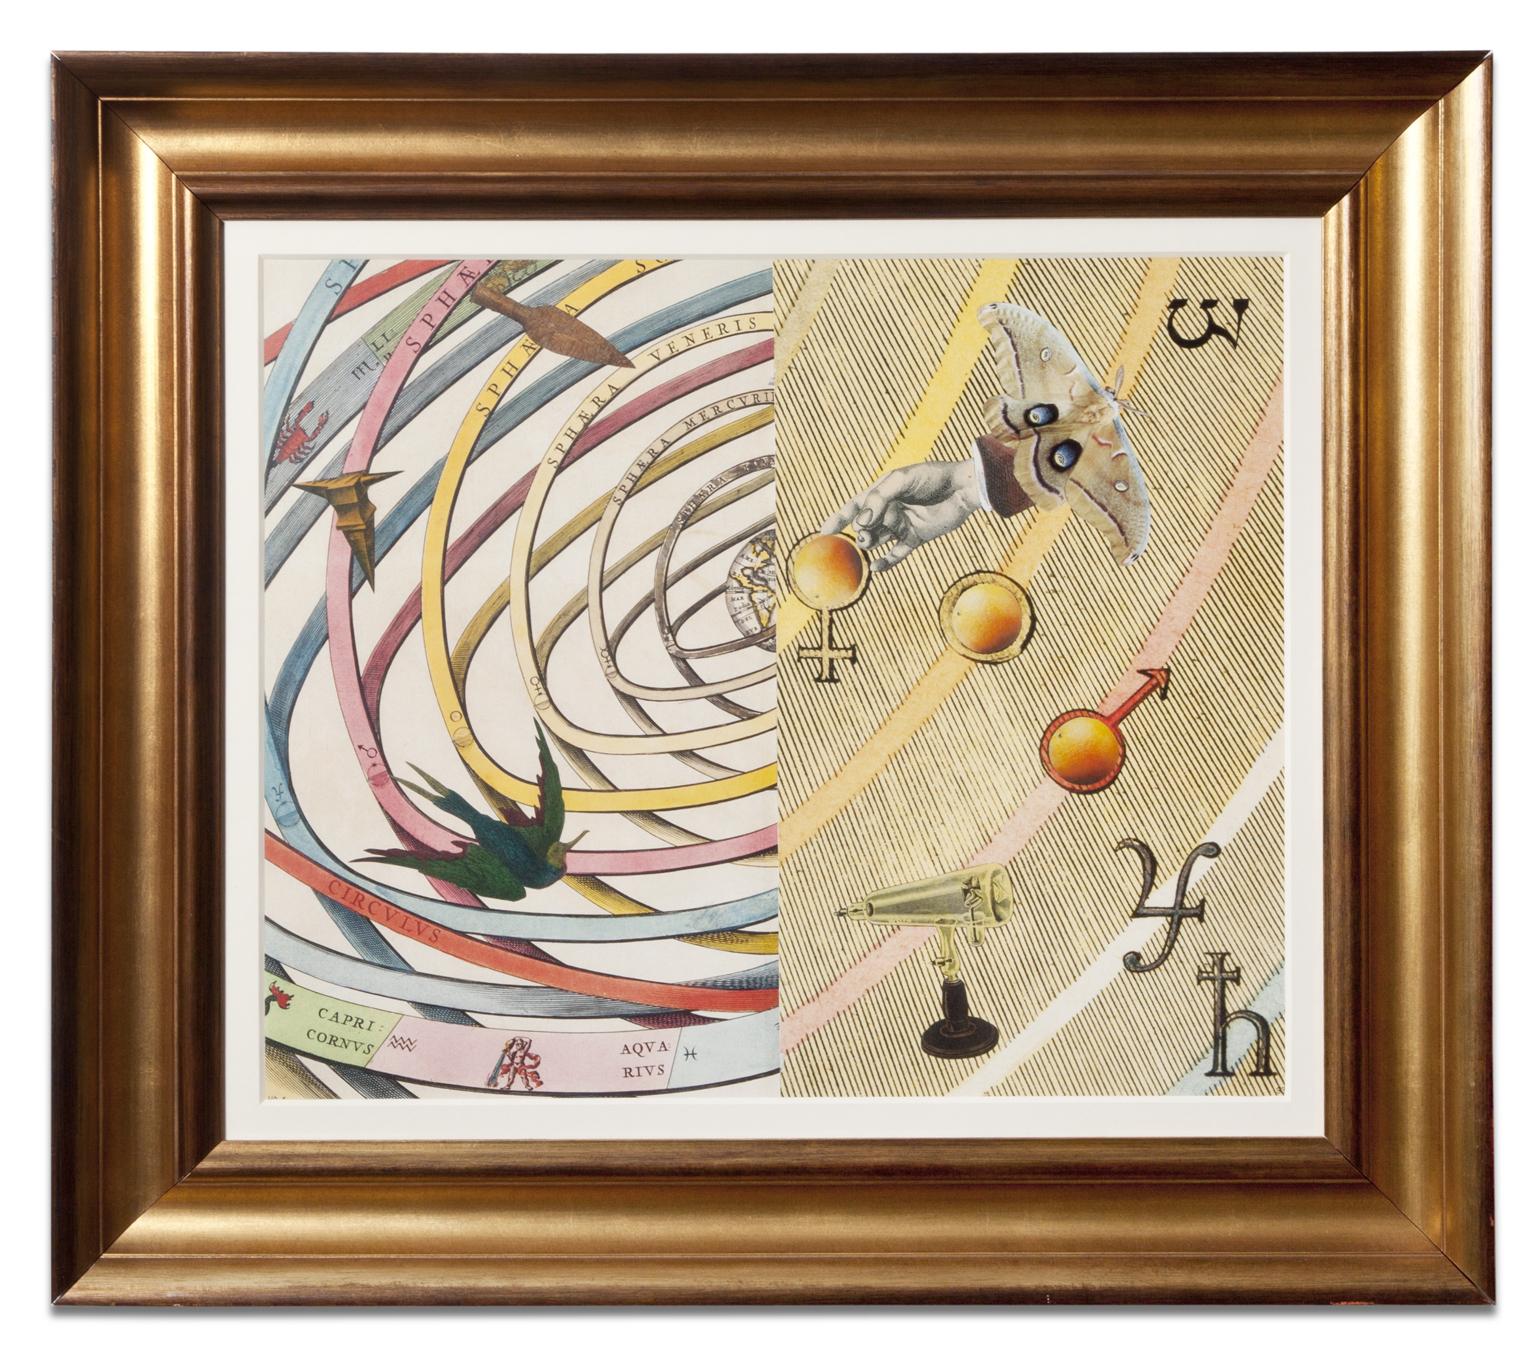 Lawrence Jordan, SPHAERA VENERIS, 2013, collage, 21 x 25 inches